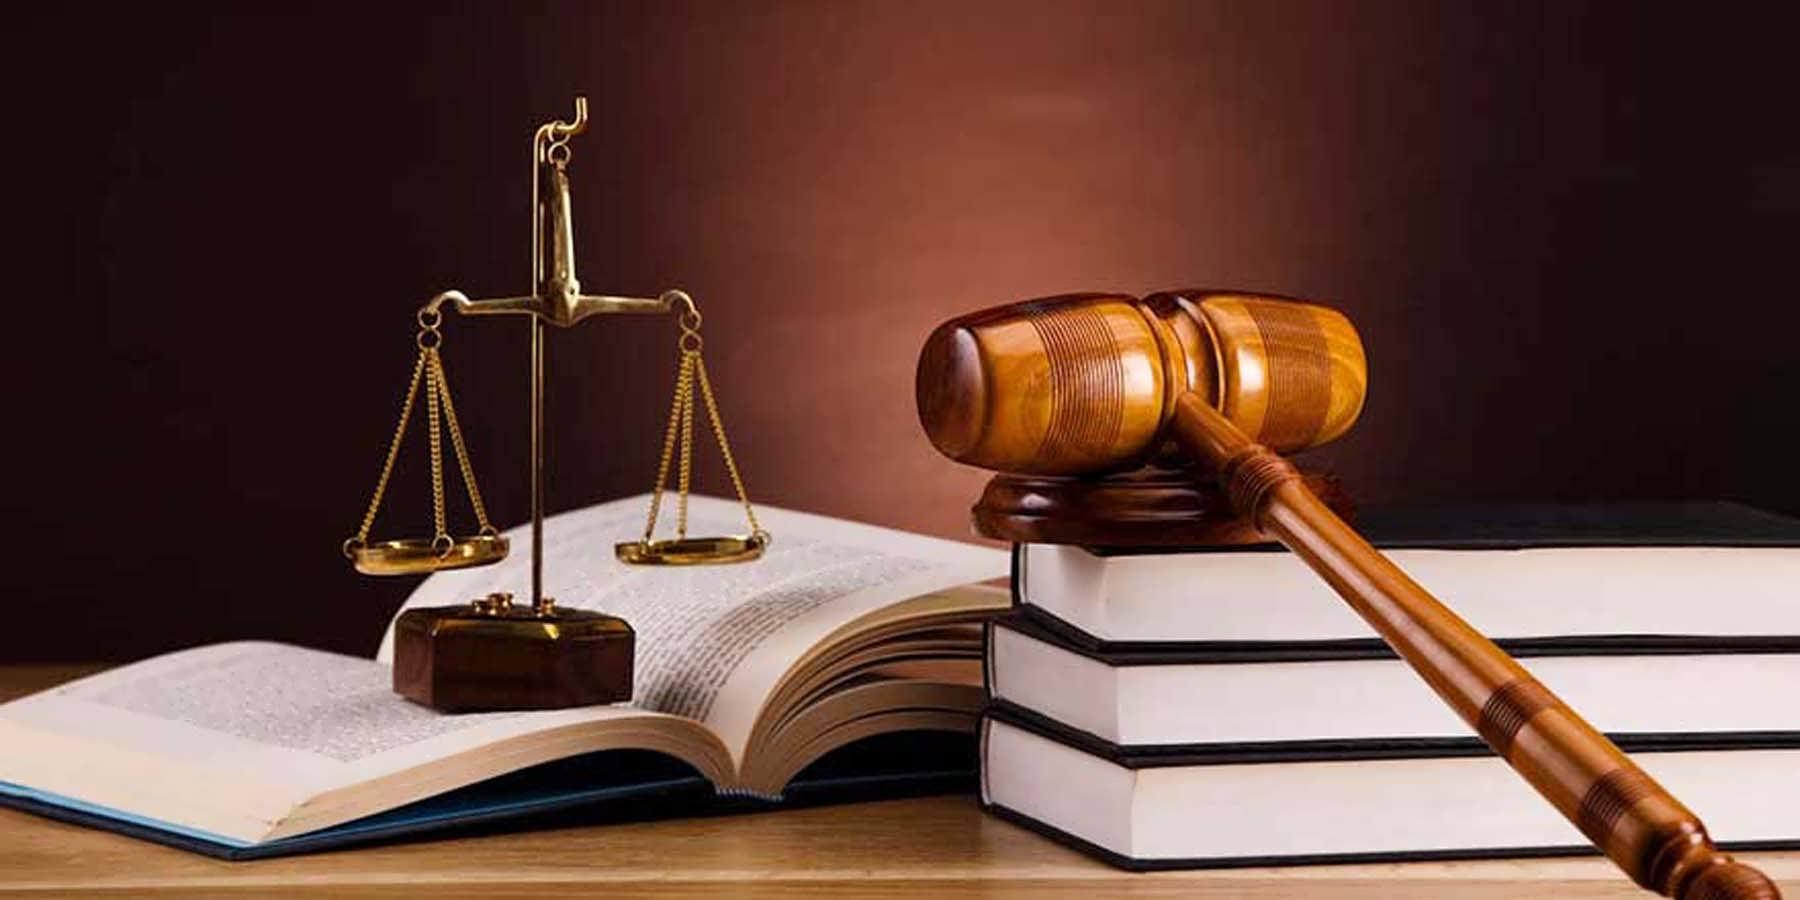 İdare Mahkemesinden Baba Kararı